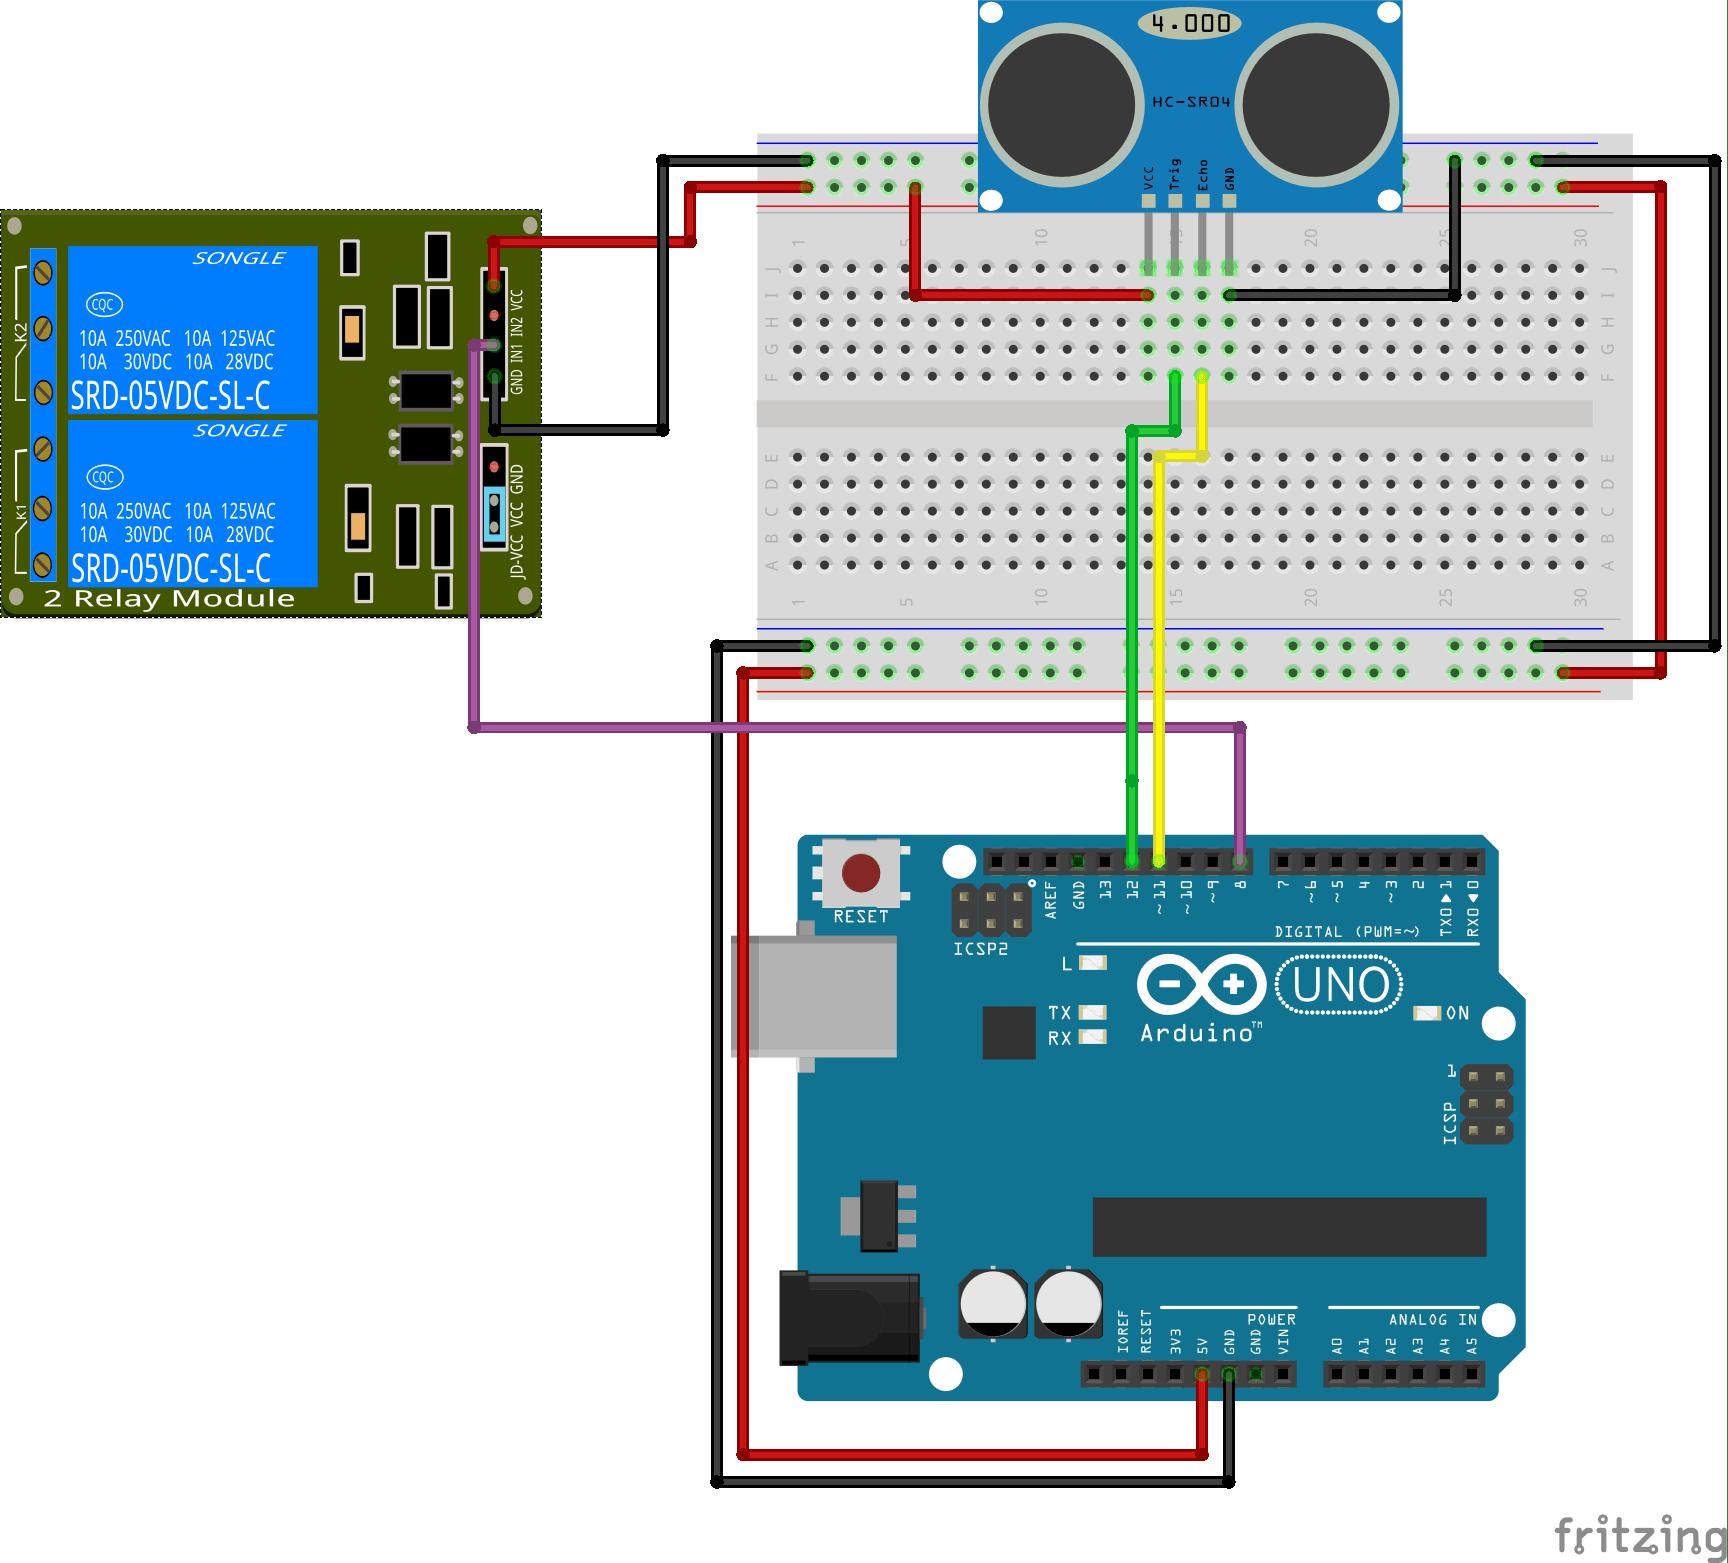 small resolution of leviton ceiling occupancy sensor wiring diagram leviton photo sensor wiring diagram watt stopper ls 102